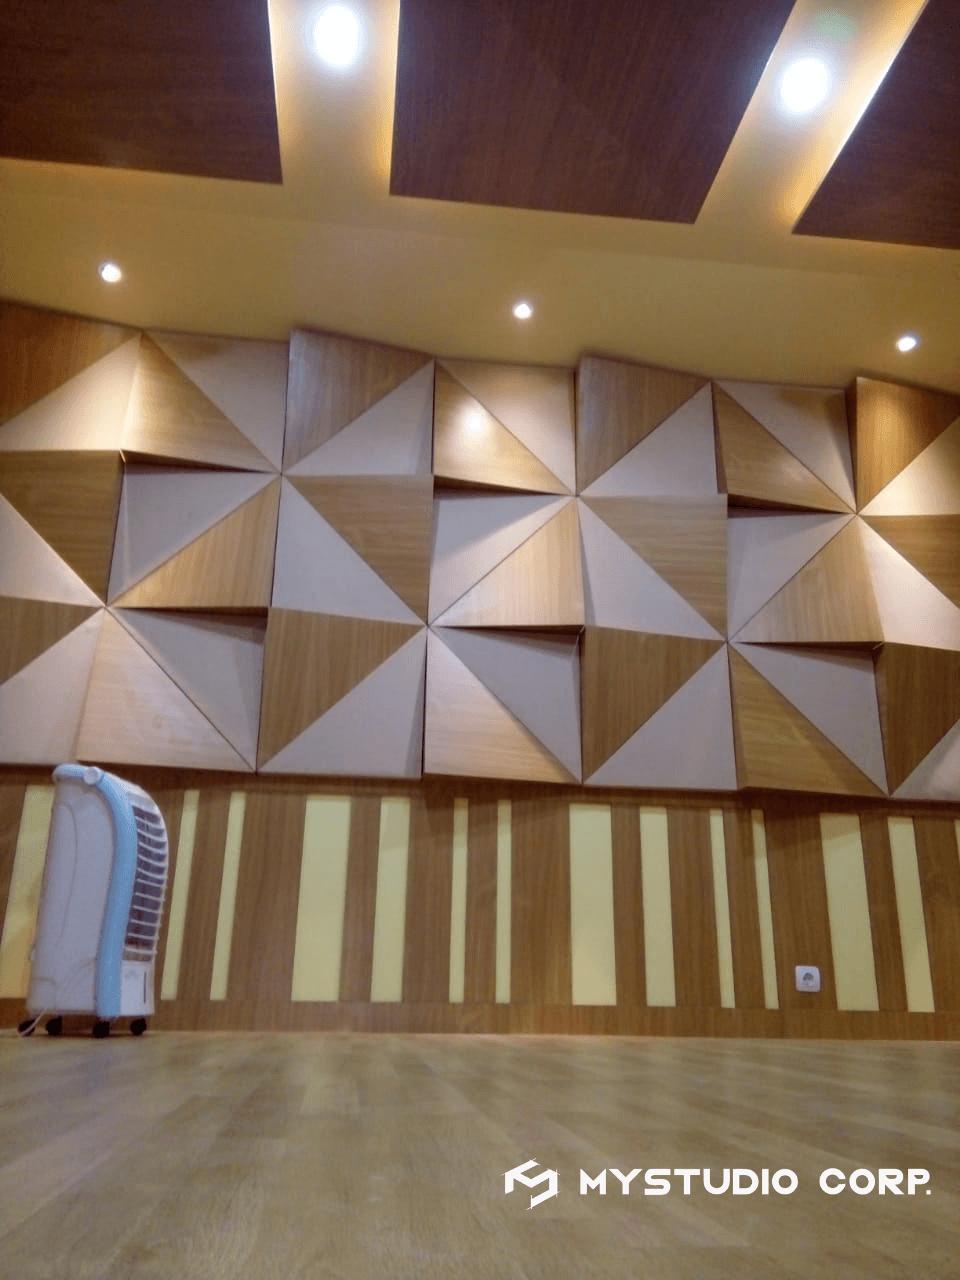 Mystudio.corp Studio Musik Cikarang Cikarang, Bekasi, Jawa Barat, Indonesia Cikarang, Bekasi, Jawa Barat, Indonesia Mystudiocorp-Studio-Musik-Cikarang   81515